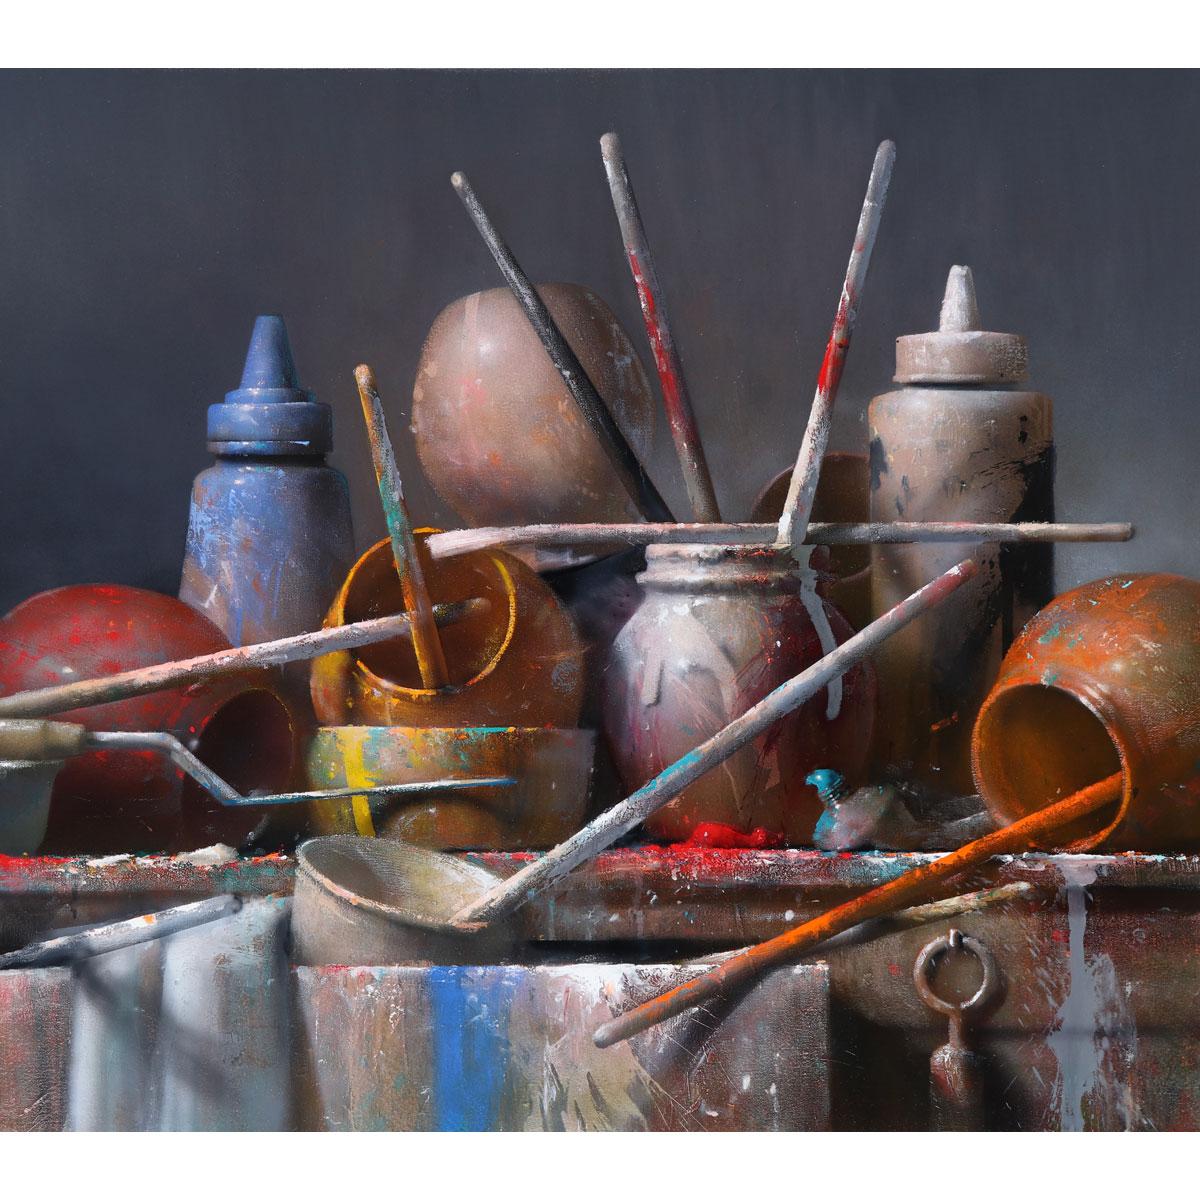 Leverage by David Dornan